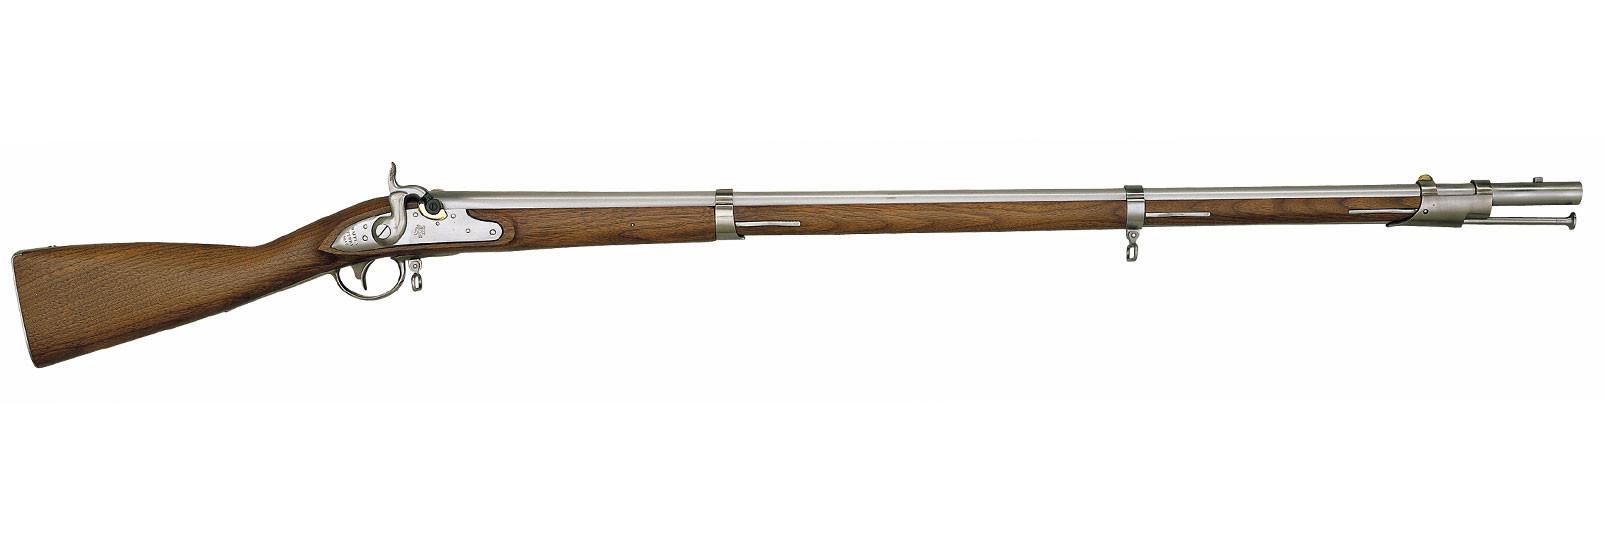 Fucile 1816 Harper's Ferry Colt Conversion